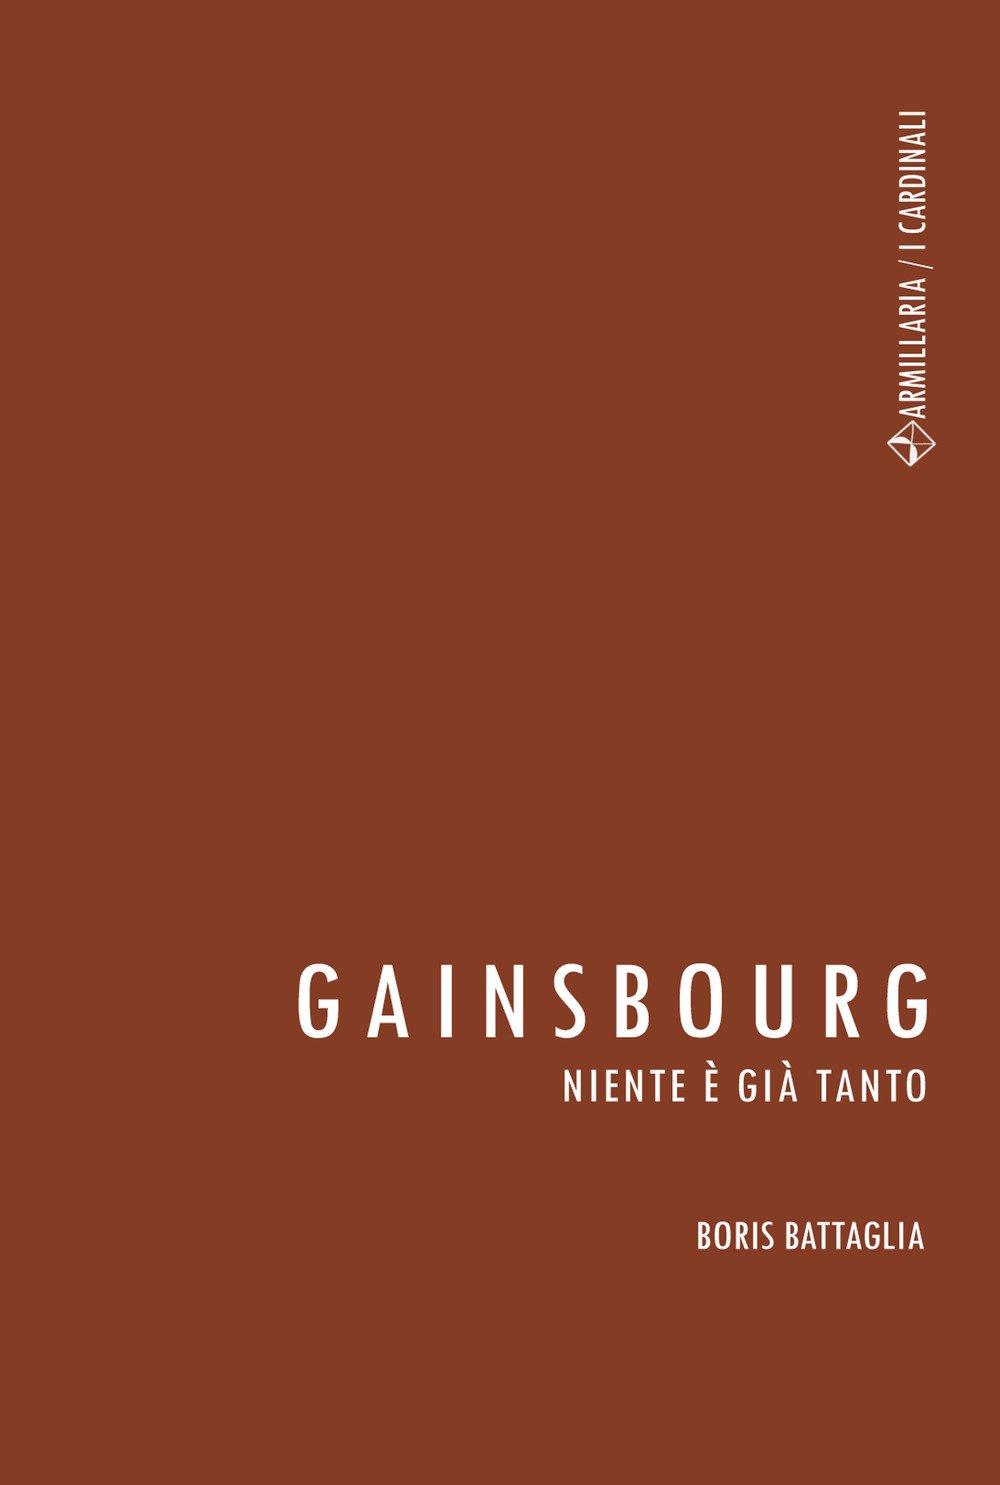 Gainsbourg. Niente è già tanto